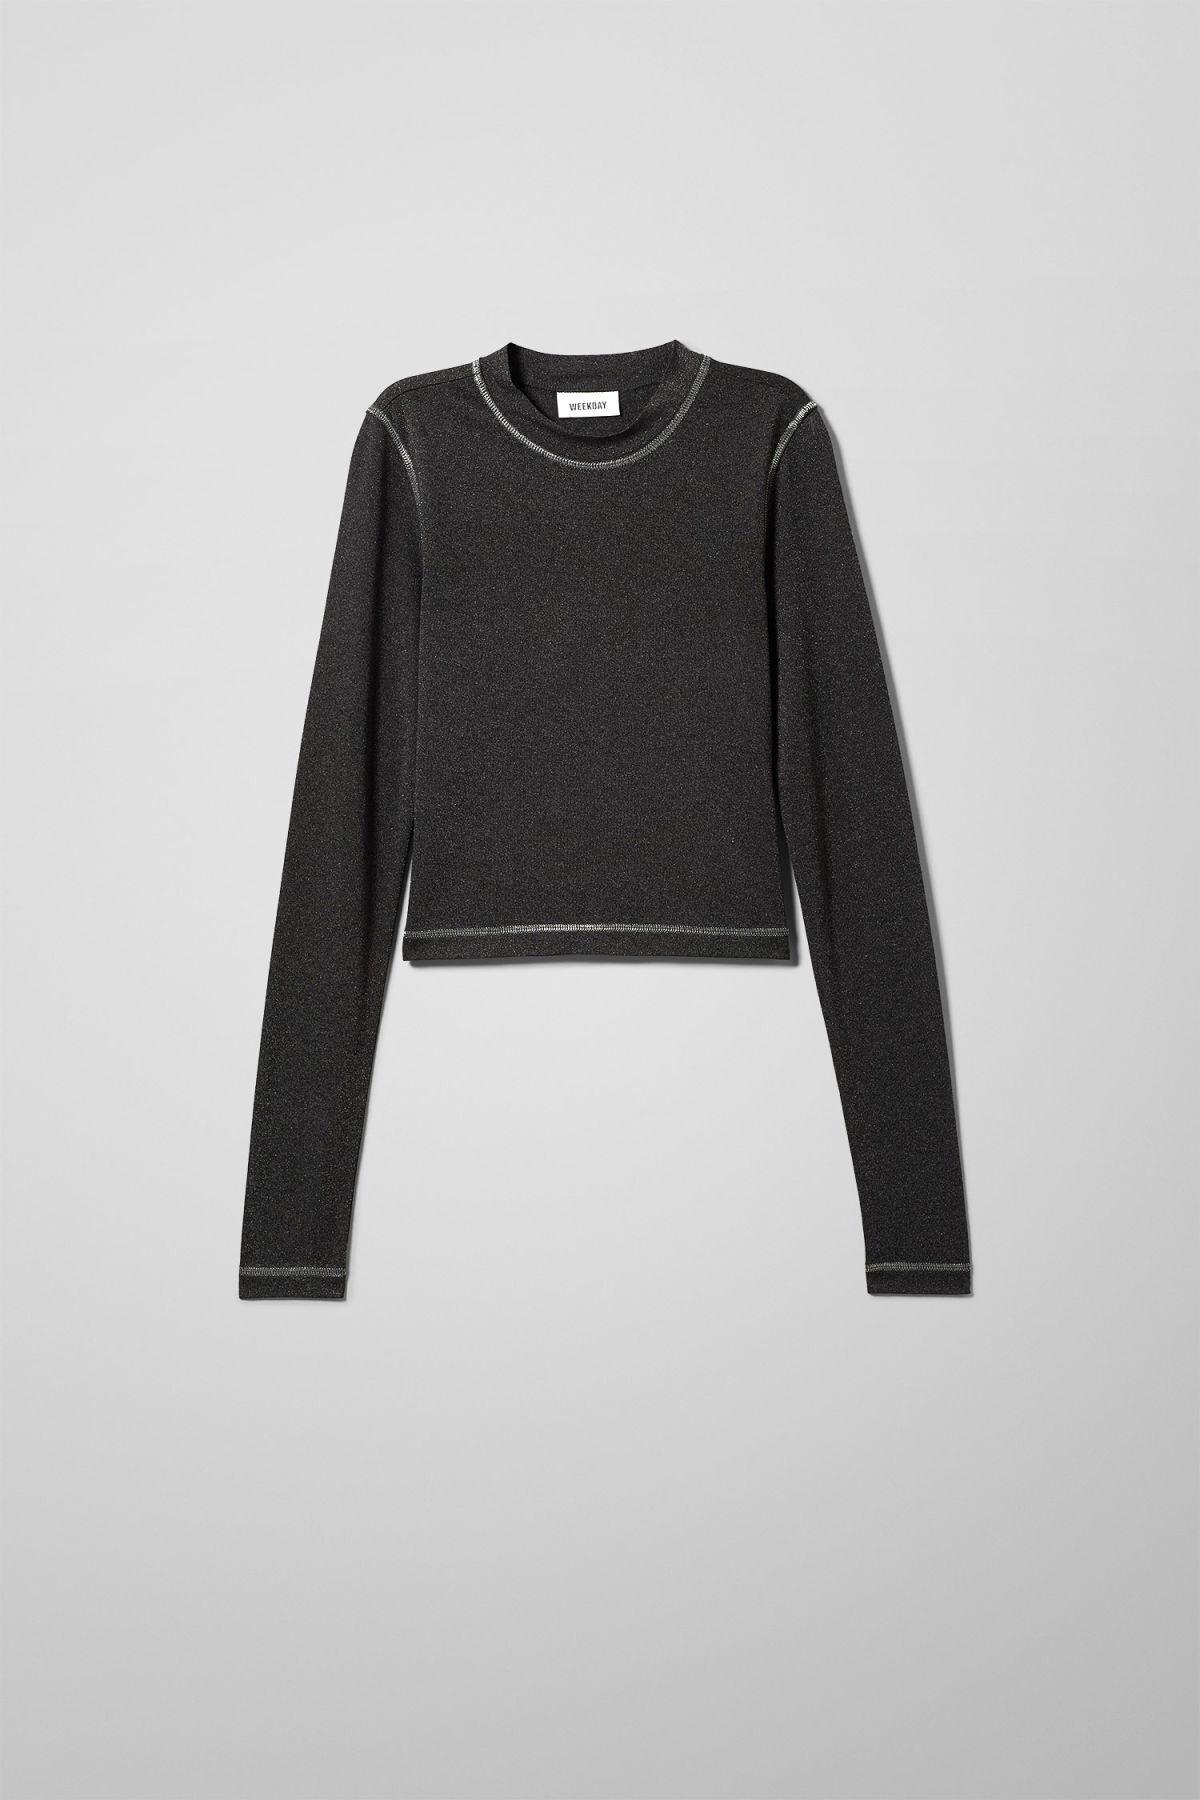 Image of Oak Long Sleeve Top - Black-XS